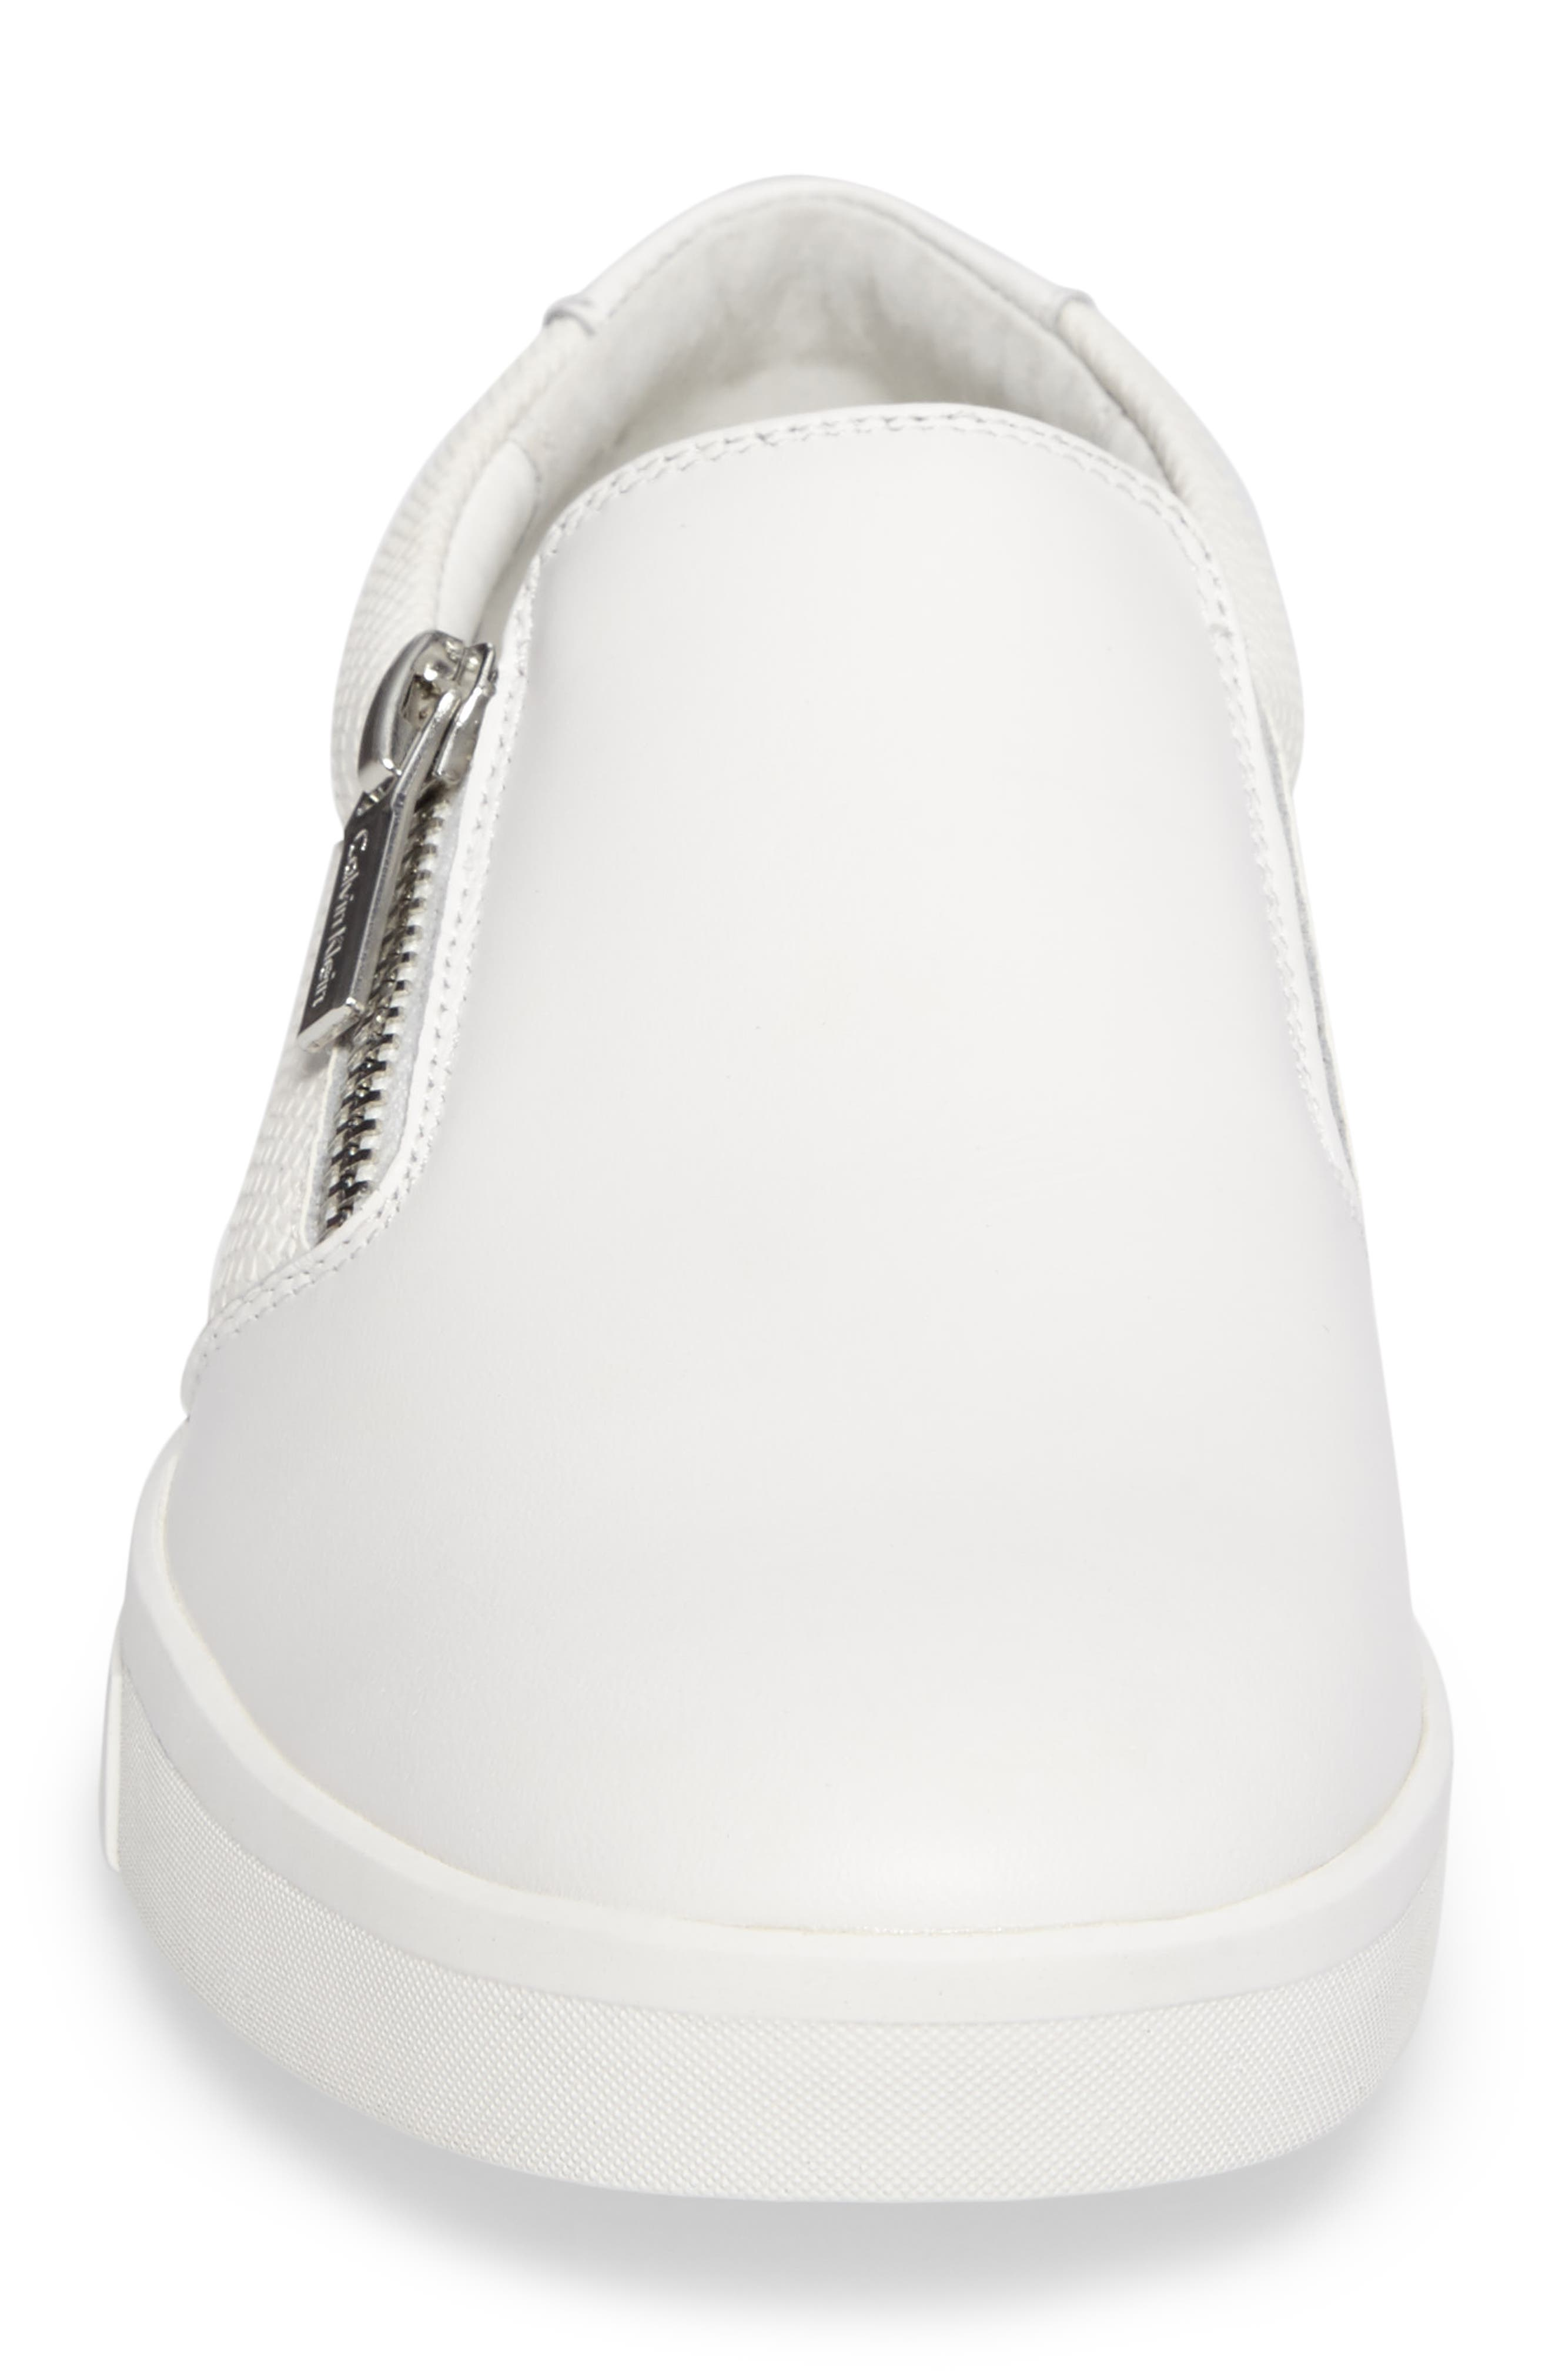 Ibiza Slip-On Zip Sneaker,                             Alternate thumbnail 4, color,                             White Leather